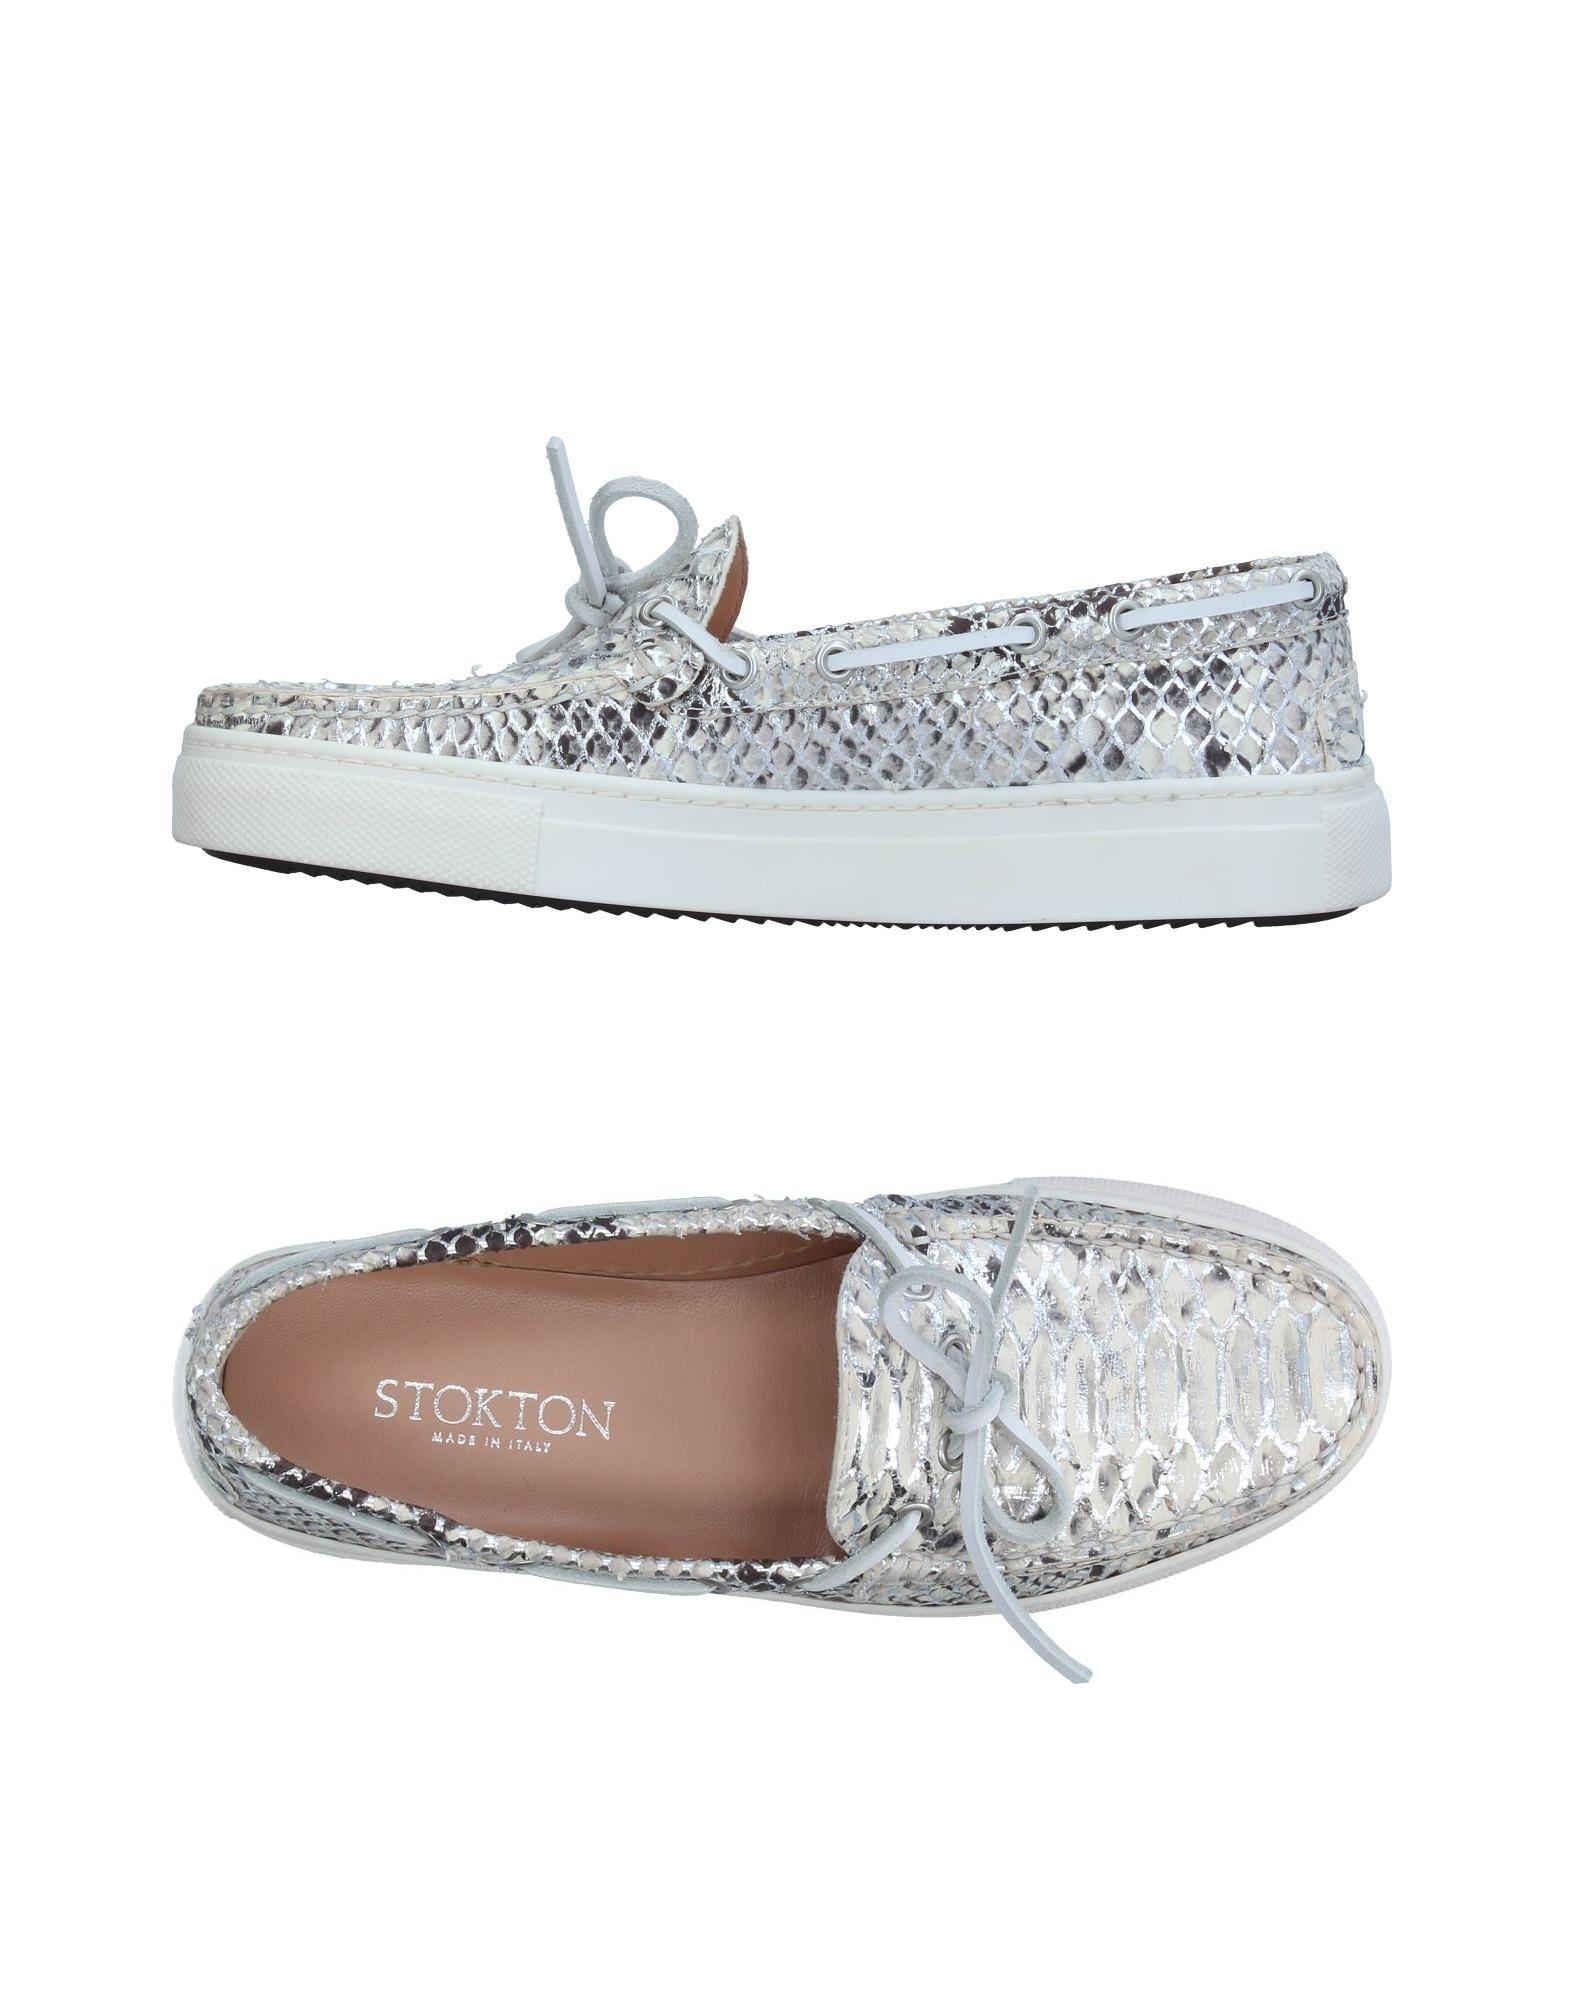 Stokton Mokassins Mokassins Stokton Damen  11374521CE Gute Qualität beliebte Schuhe b1cc9f